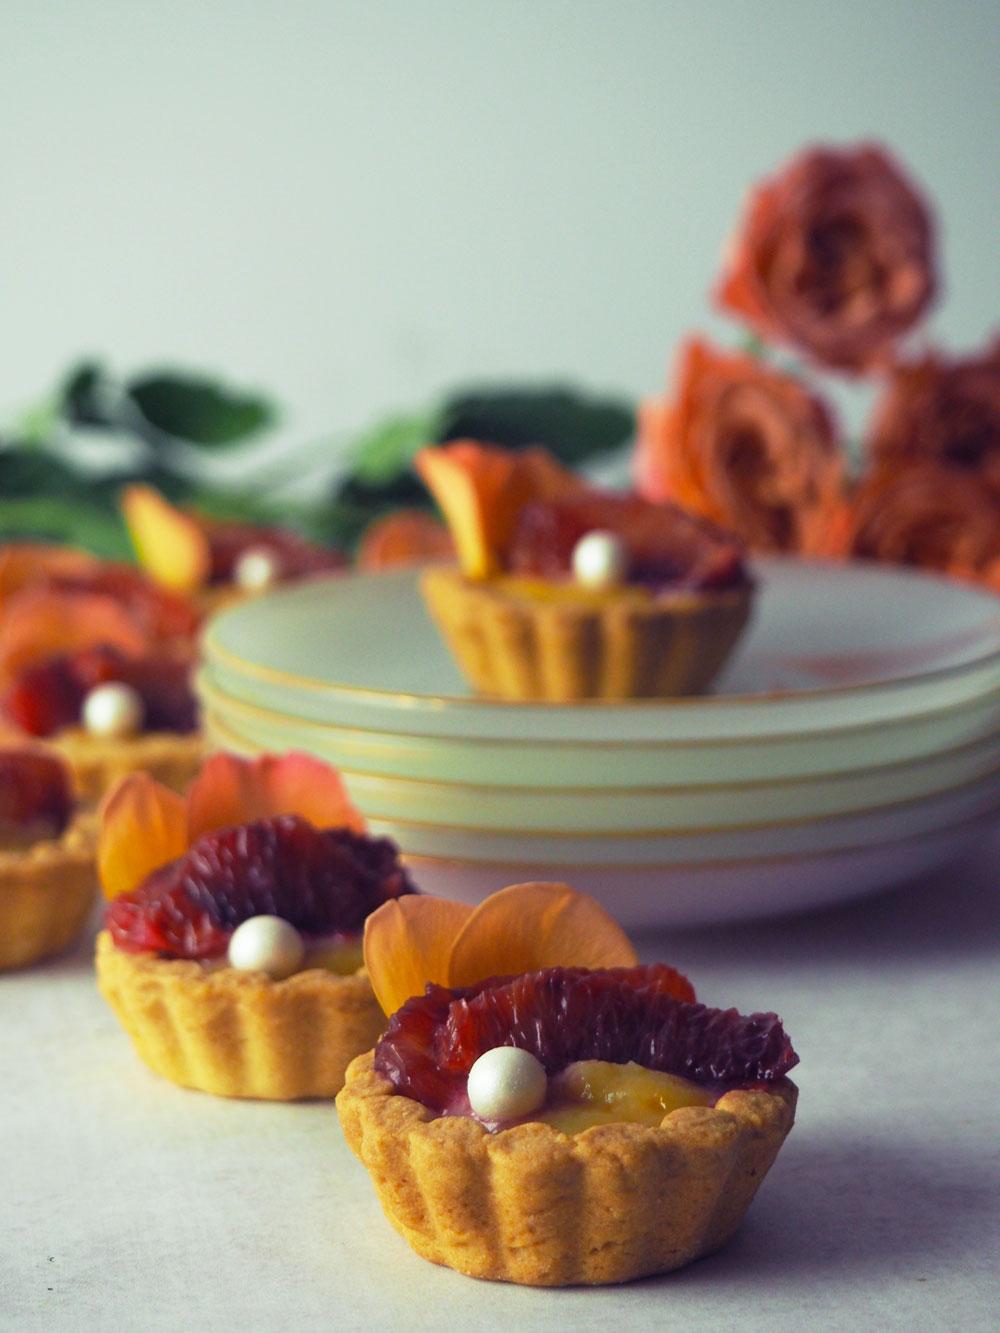 blood-orange-tartelettes-1.jpg